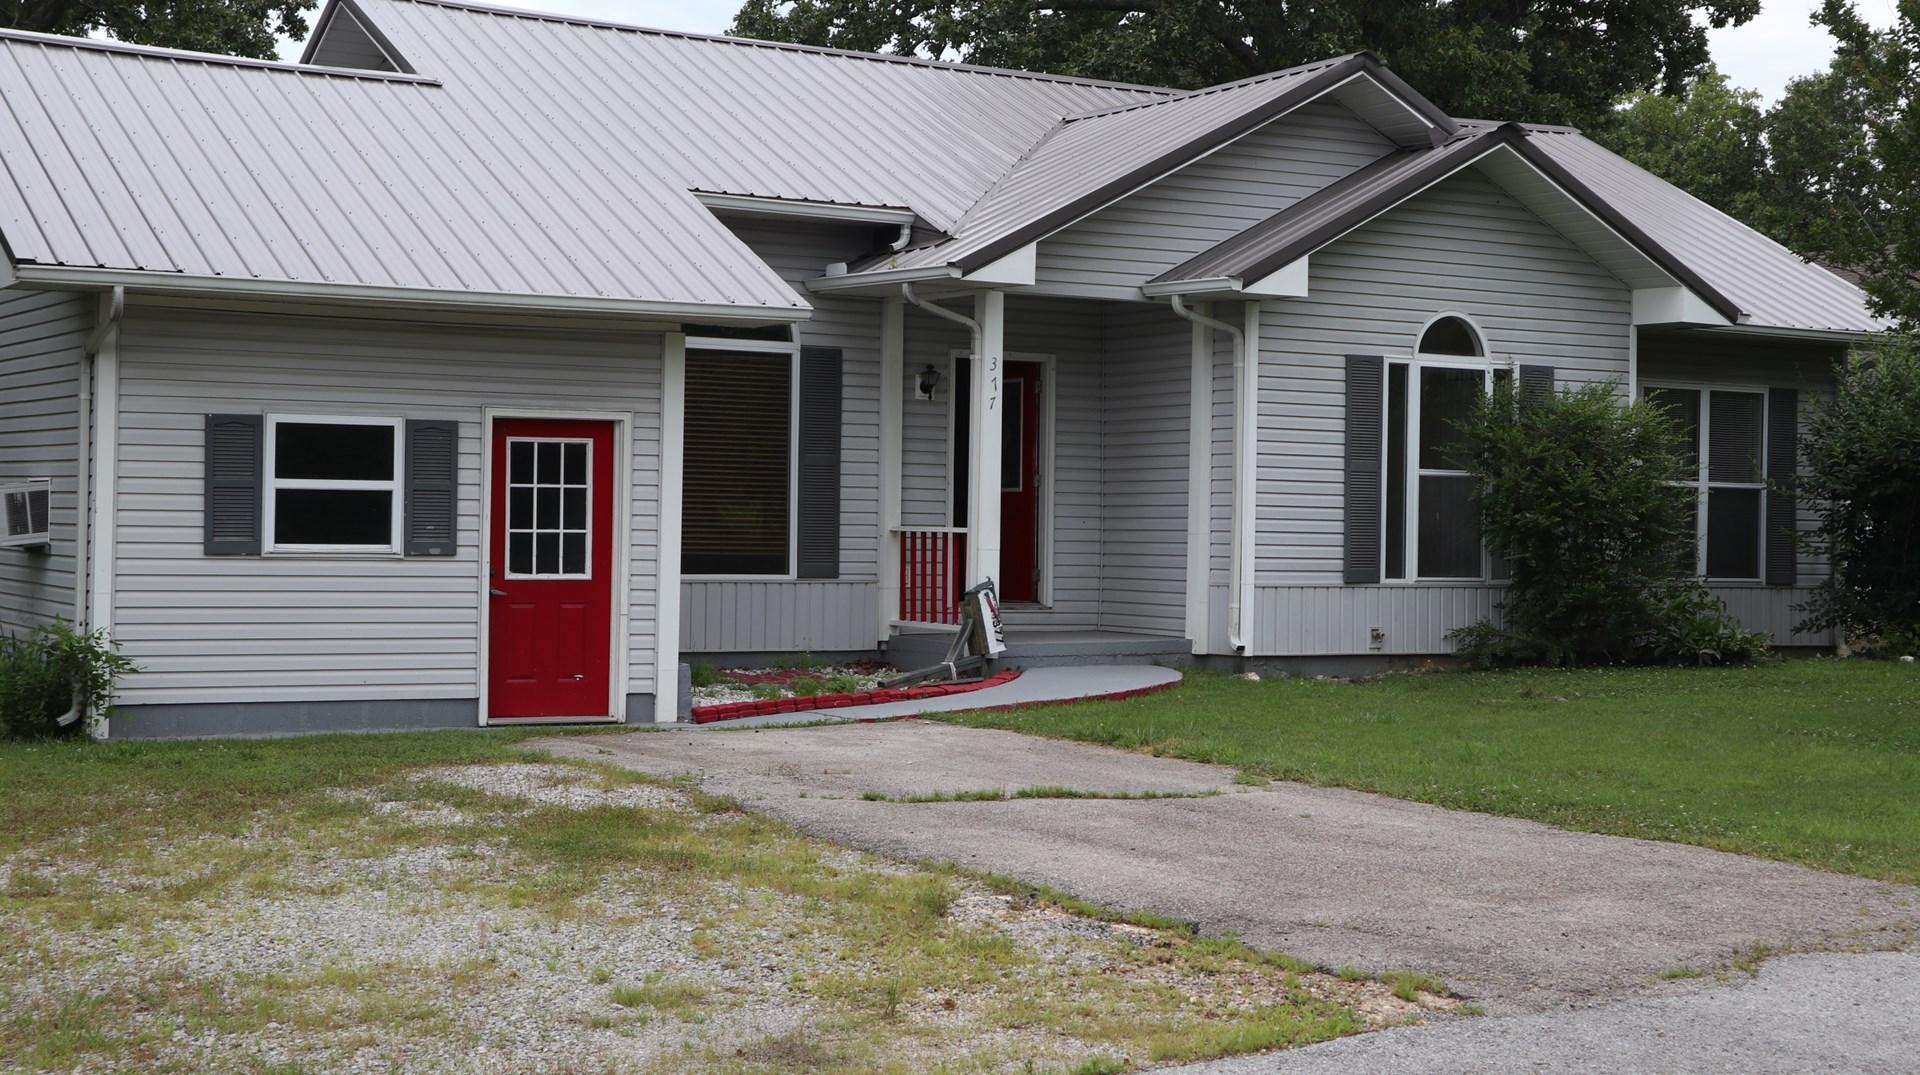 Ozarks County Home for Sale in Salem, AR